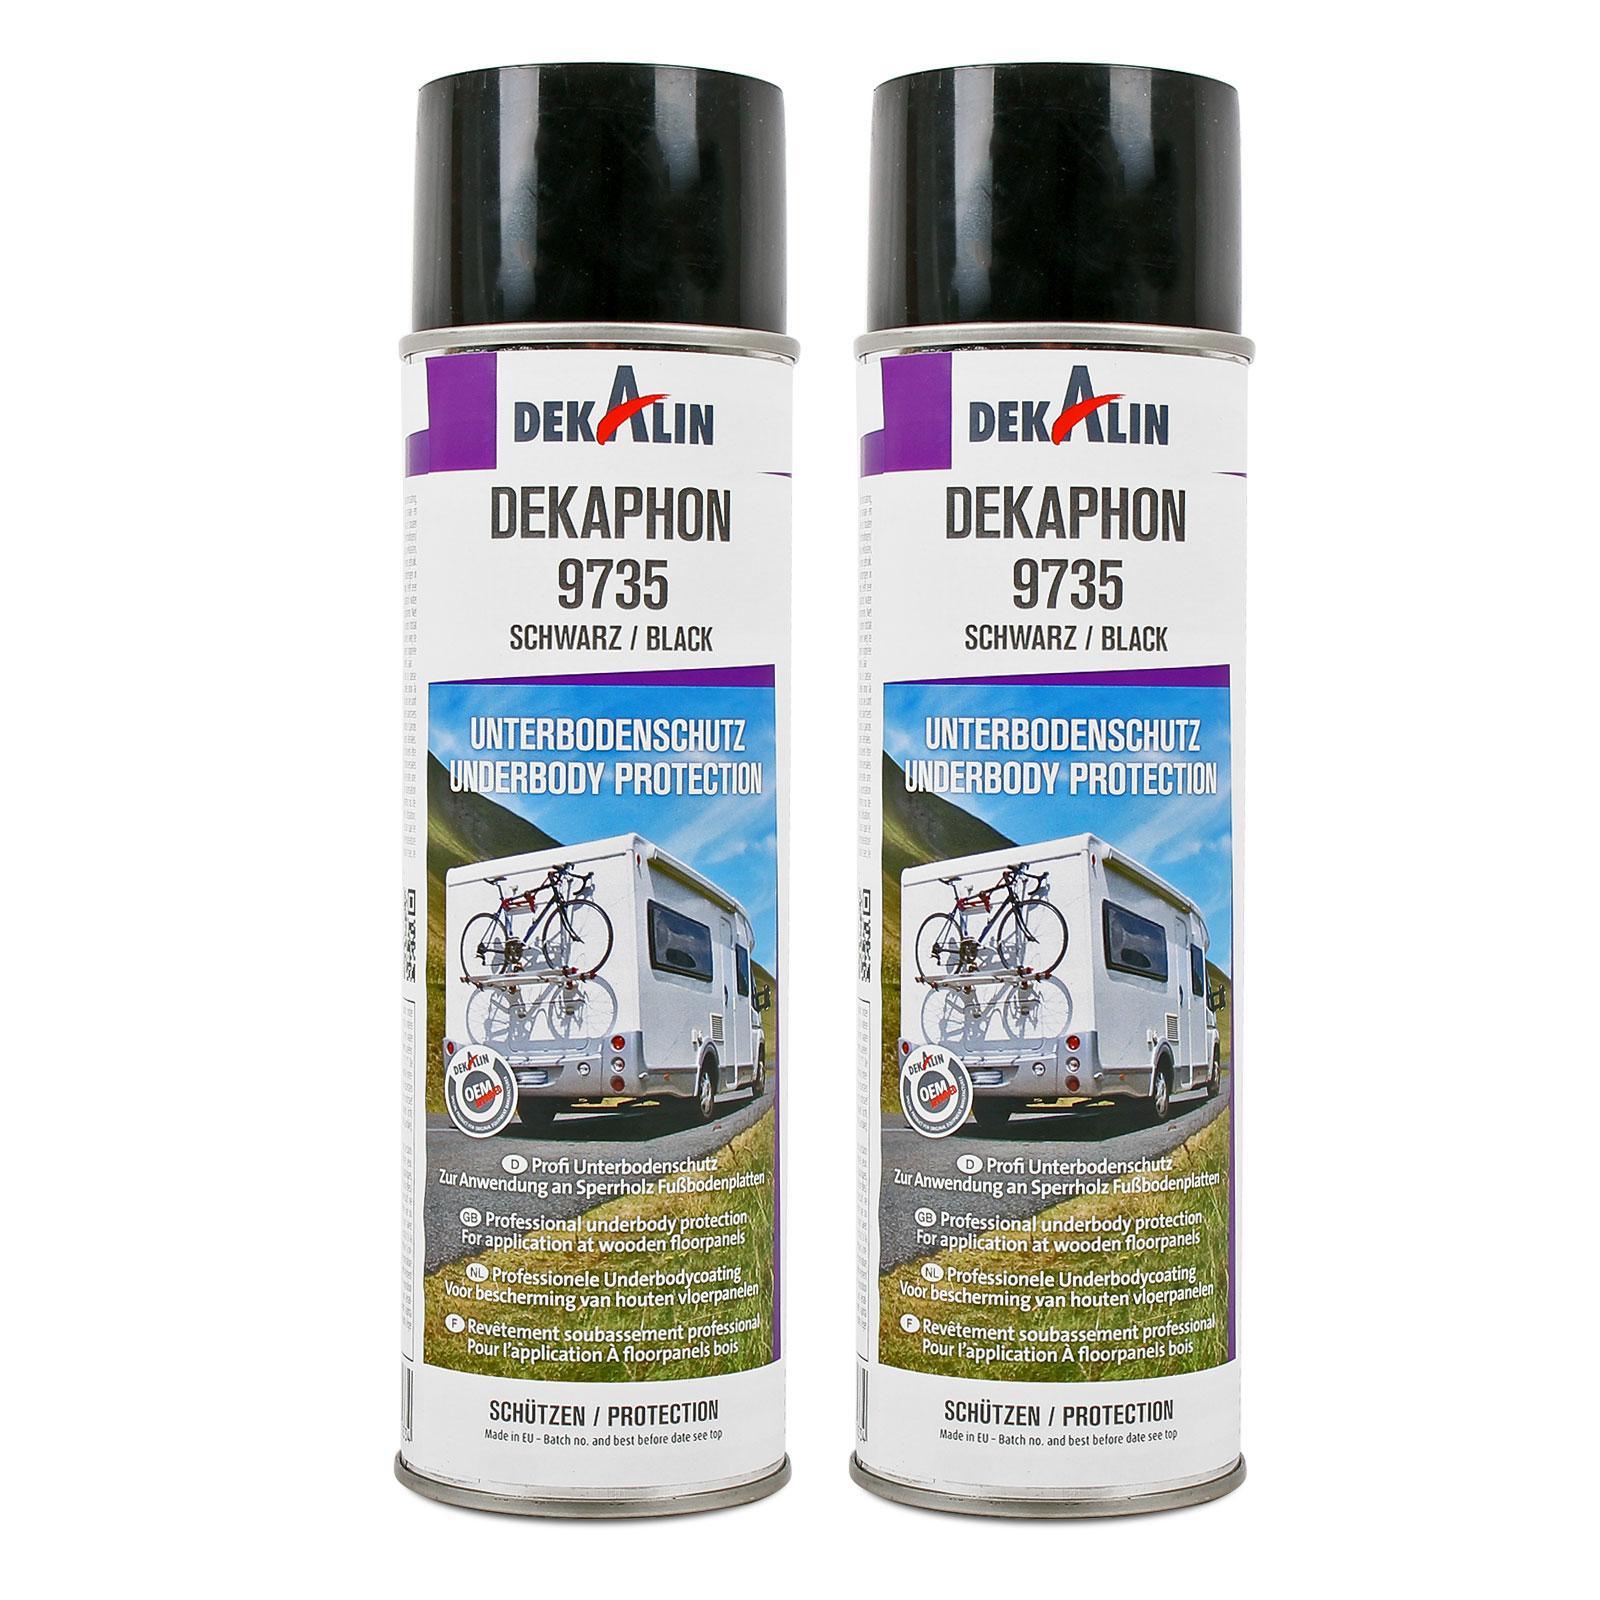 2x Dekaphon 9735 Unterbodenschutz für Sperrholz & Fußbodenplatten 500ml